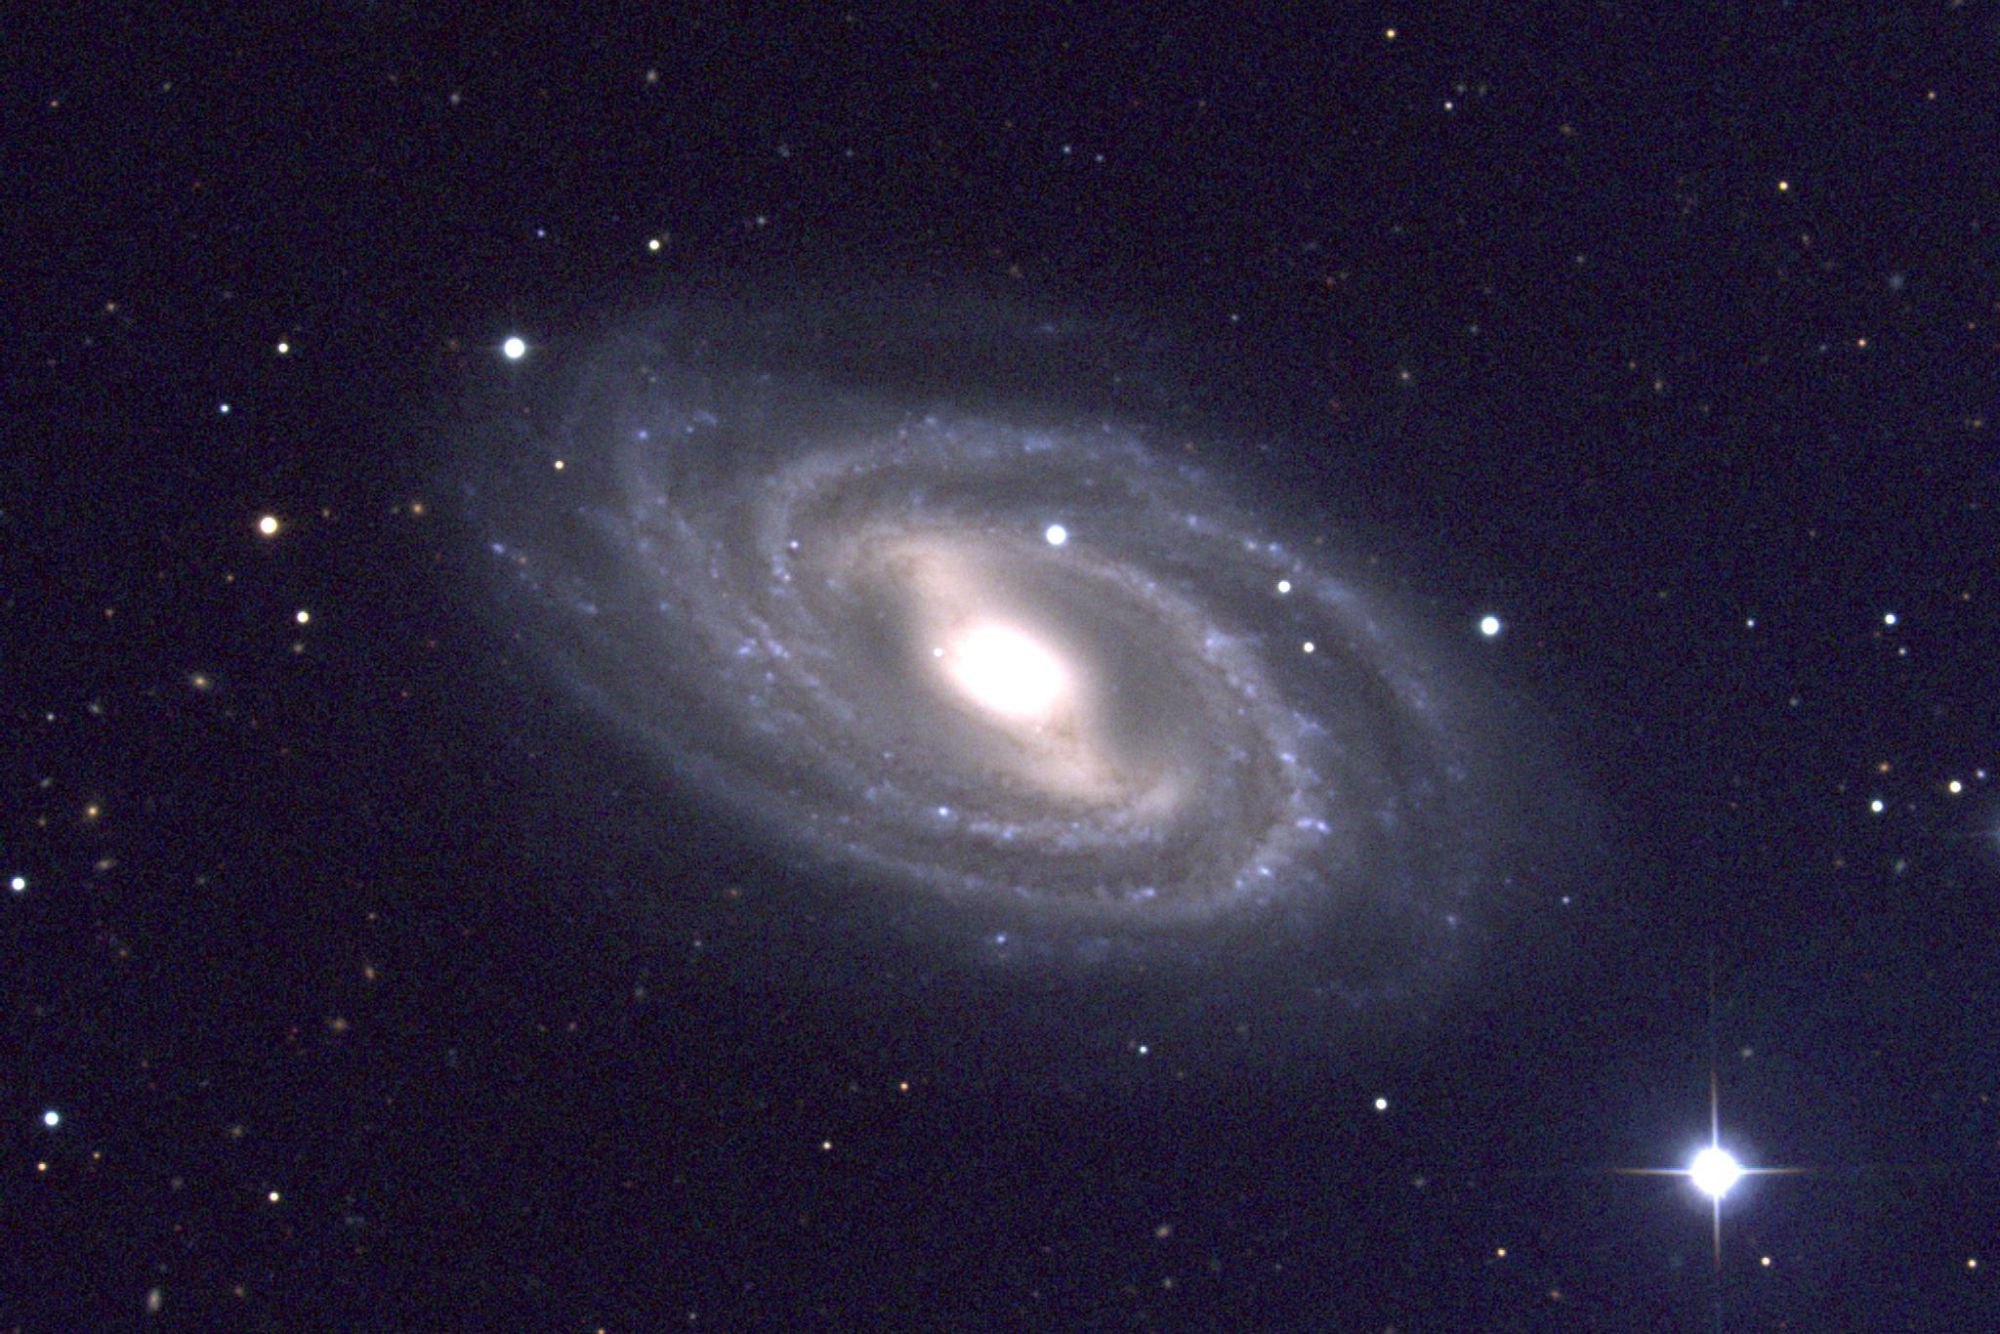 Machos could explain the nature of dark matter. © NOAO